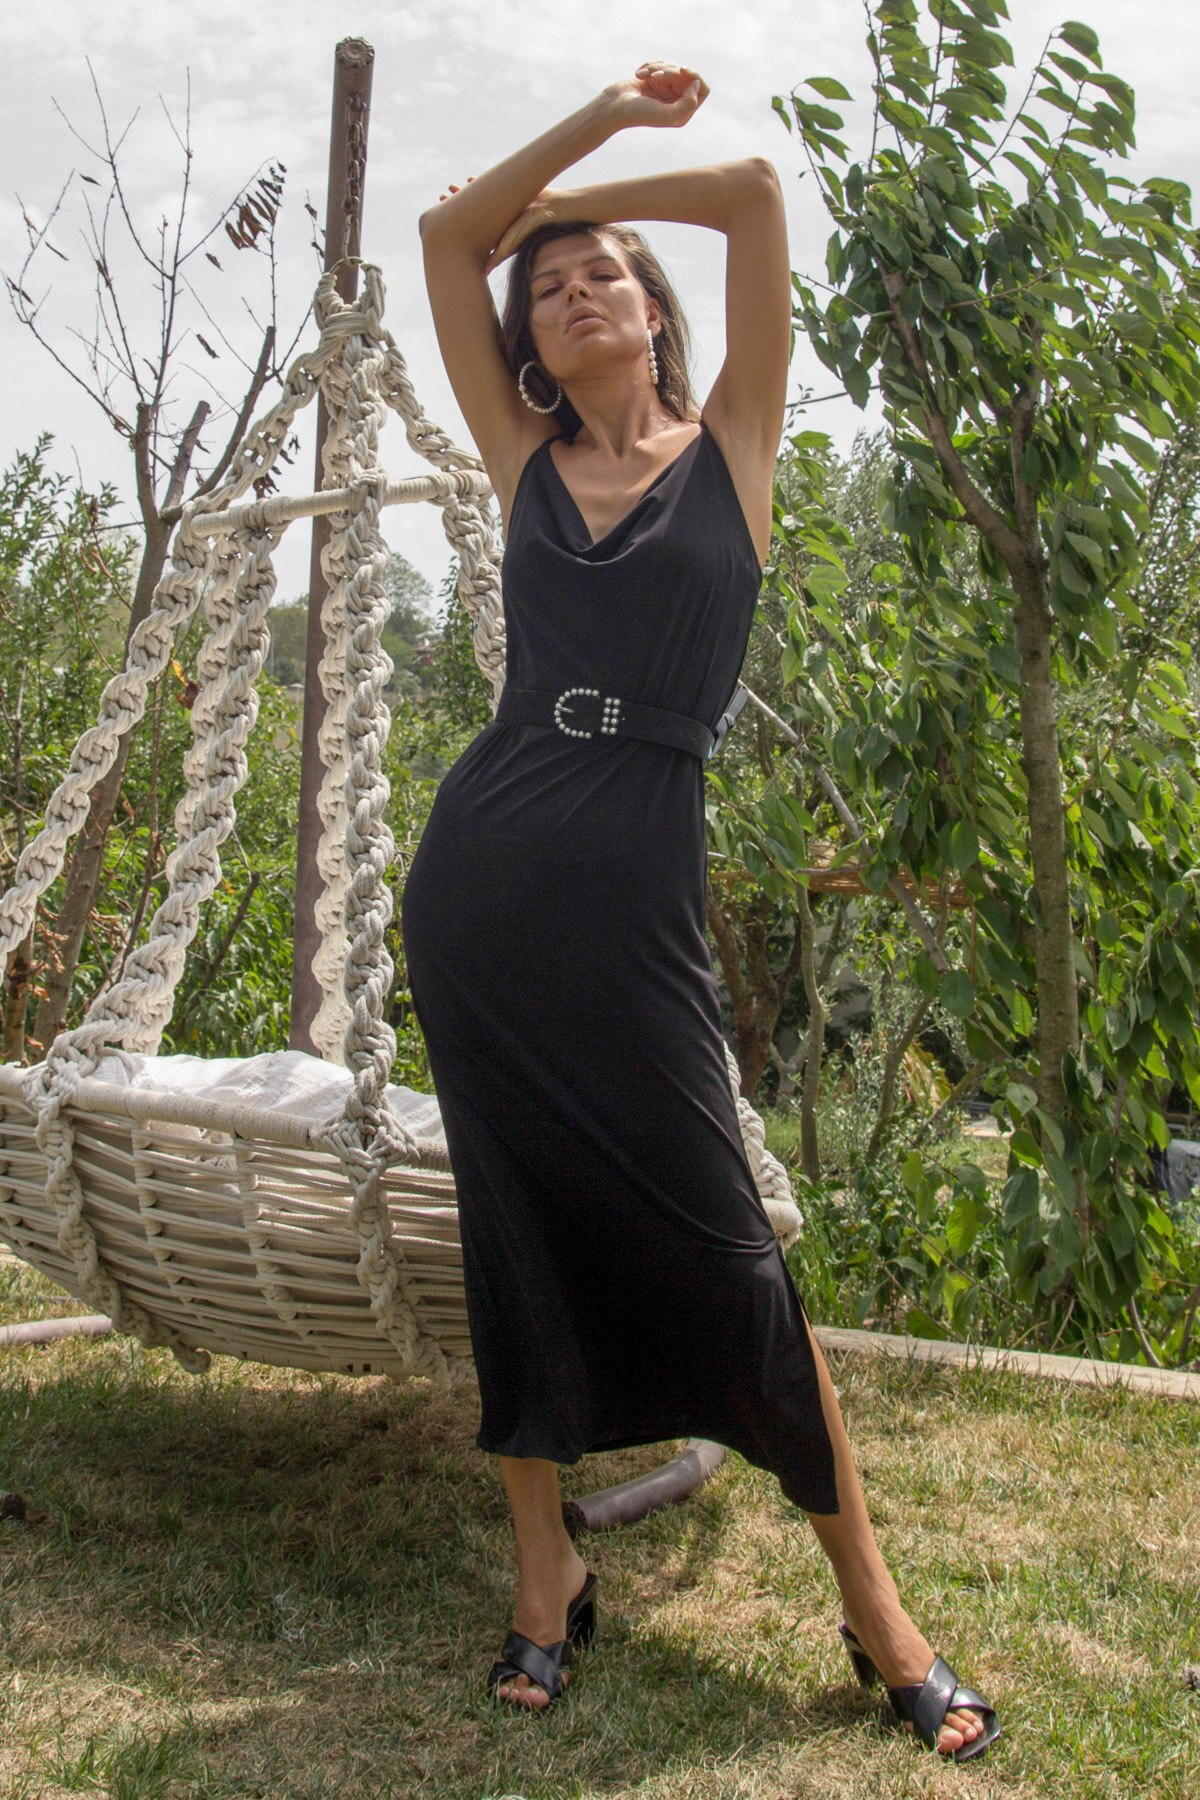 Col entonnoir pendentif robe Lycra